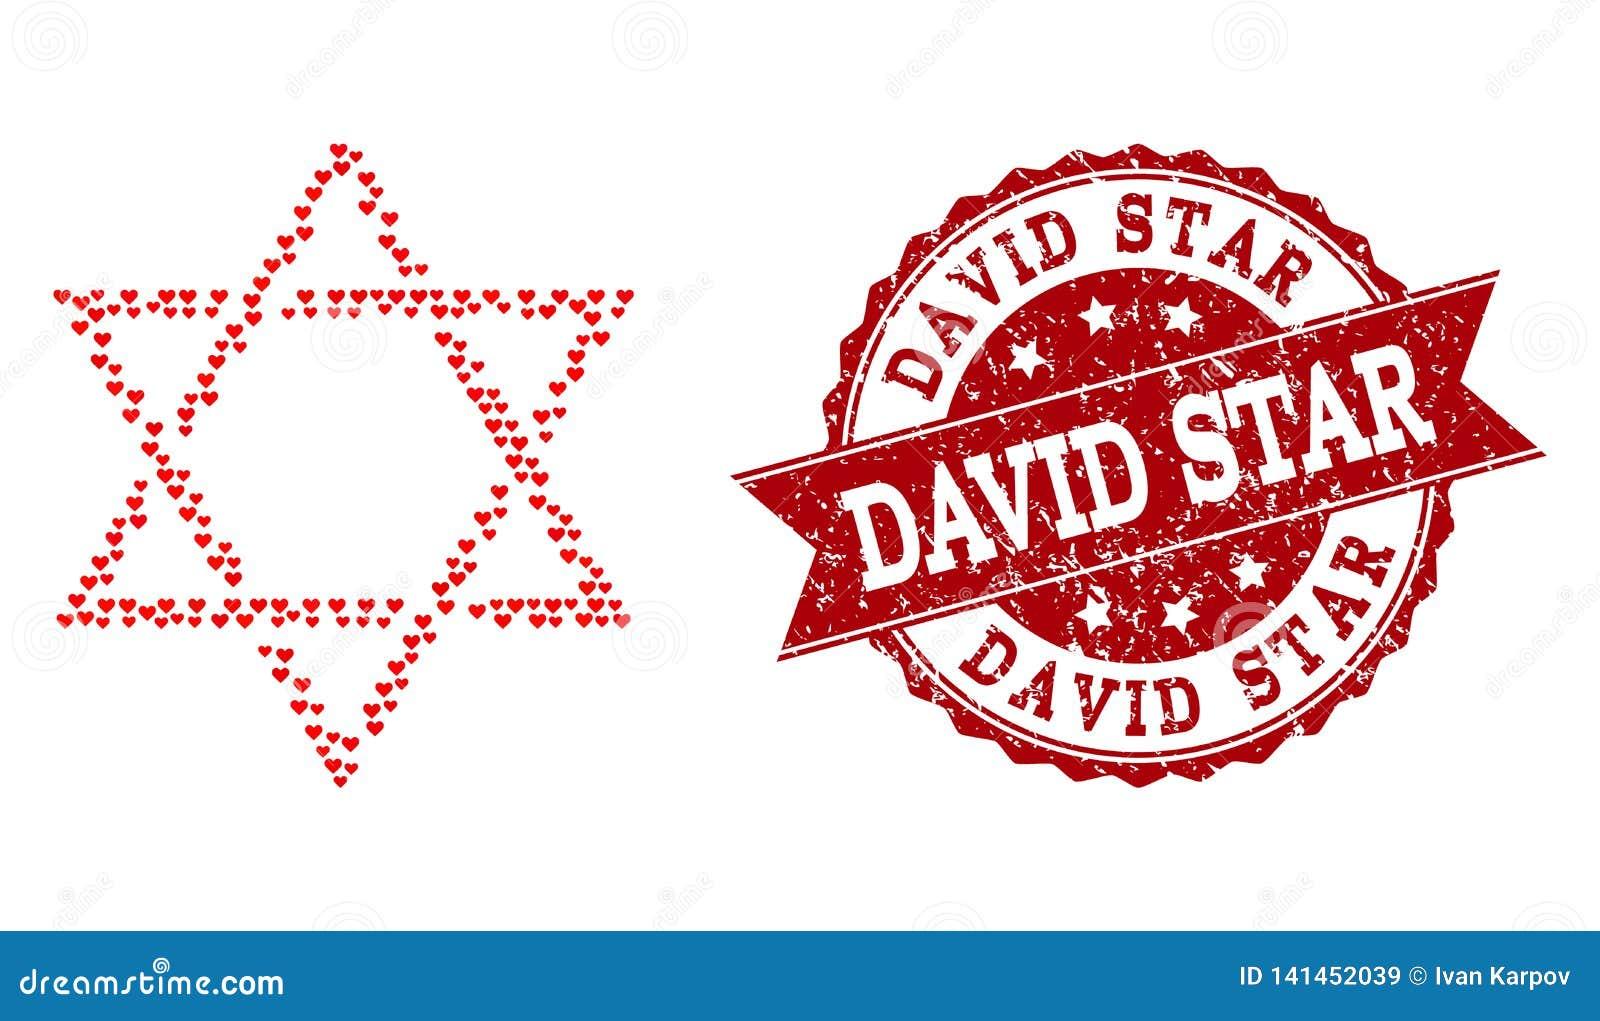 Valentine Heart Collage Of David Star Icon And Grunge